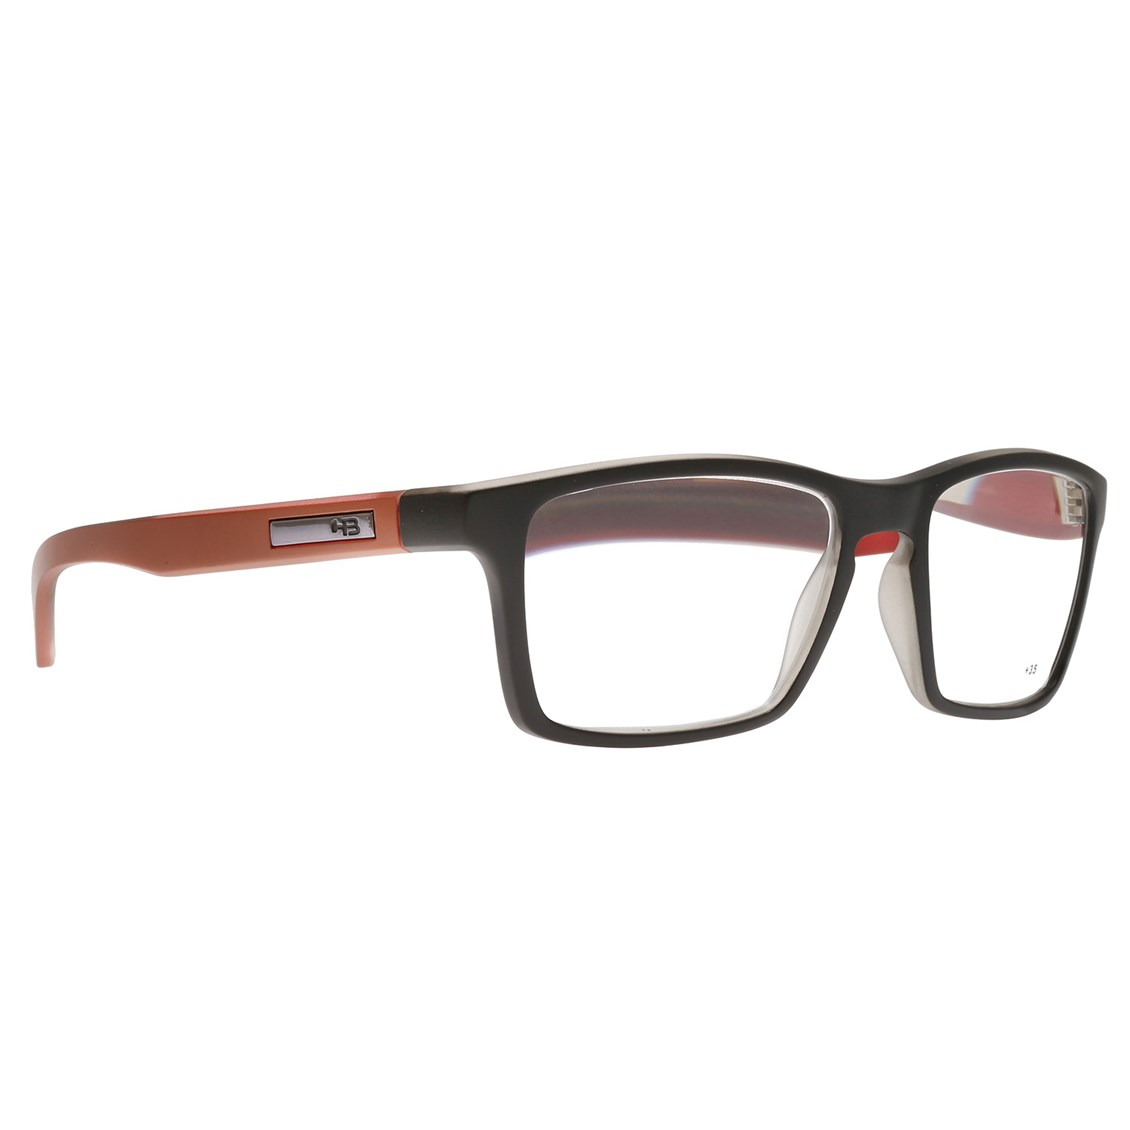 Óculos de Grau HB Polytech 93116 Matte Black/Rust On Red 792/33 - Grau +4.0